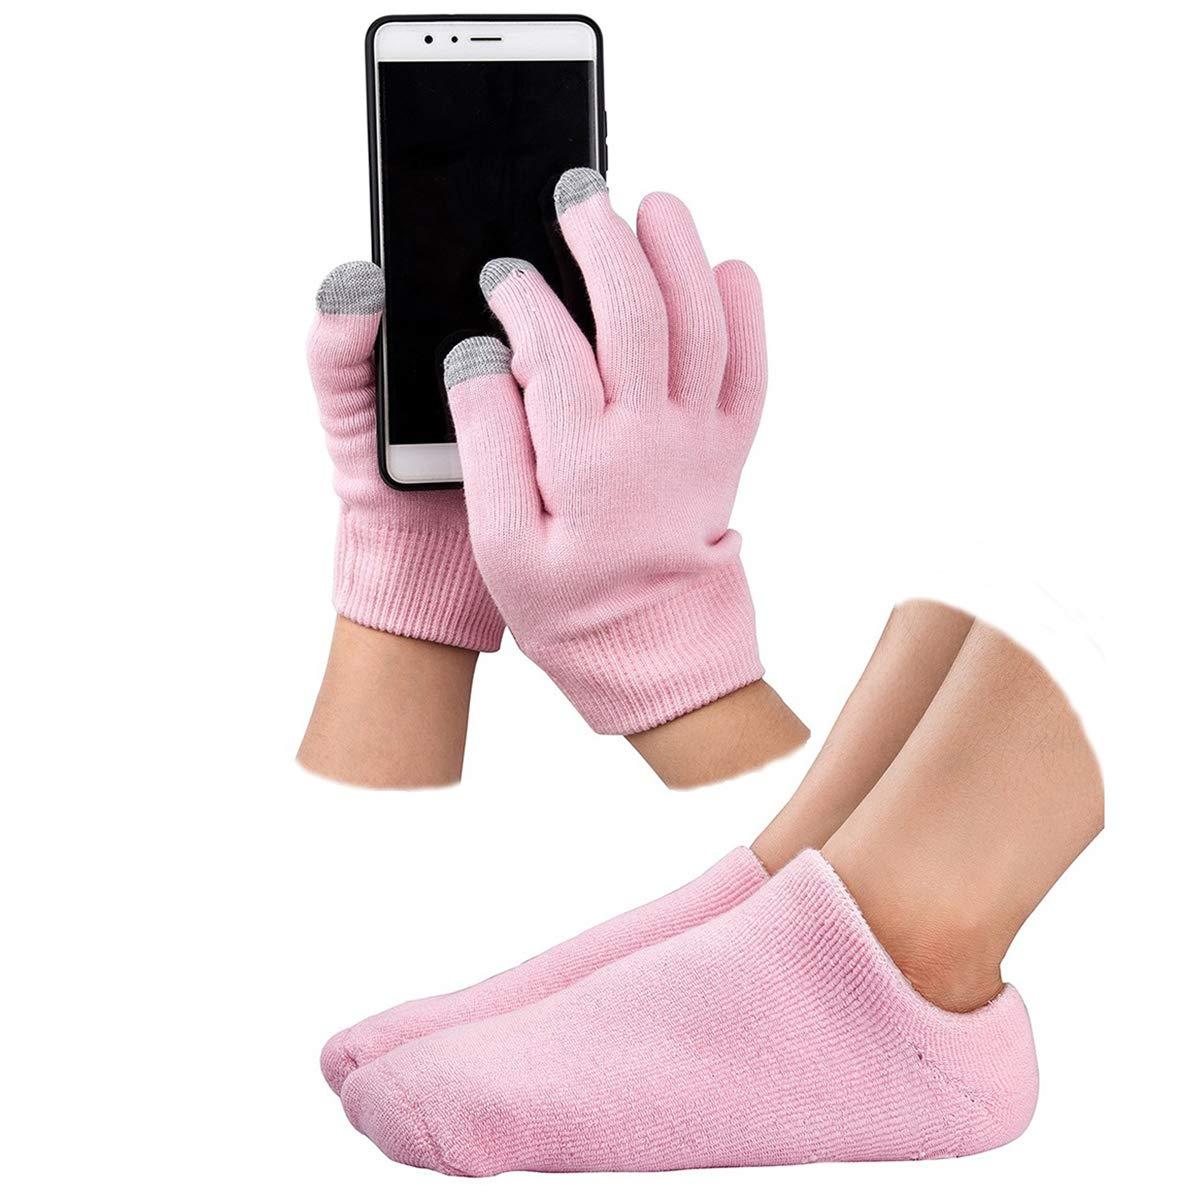 Gel Moisturizing Spa Gloves and Socks Gel Repair and Heal Eczema Cracked Dry Skin Touch Screen Moisturizing Gloves